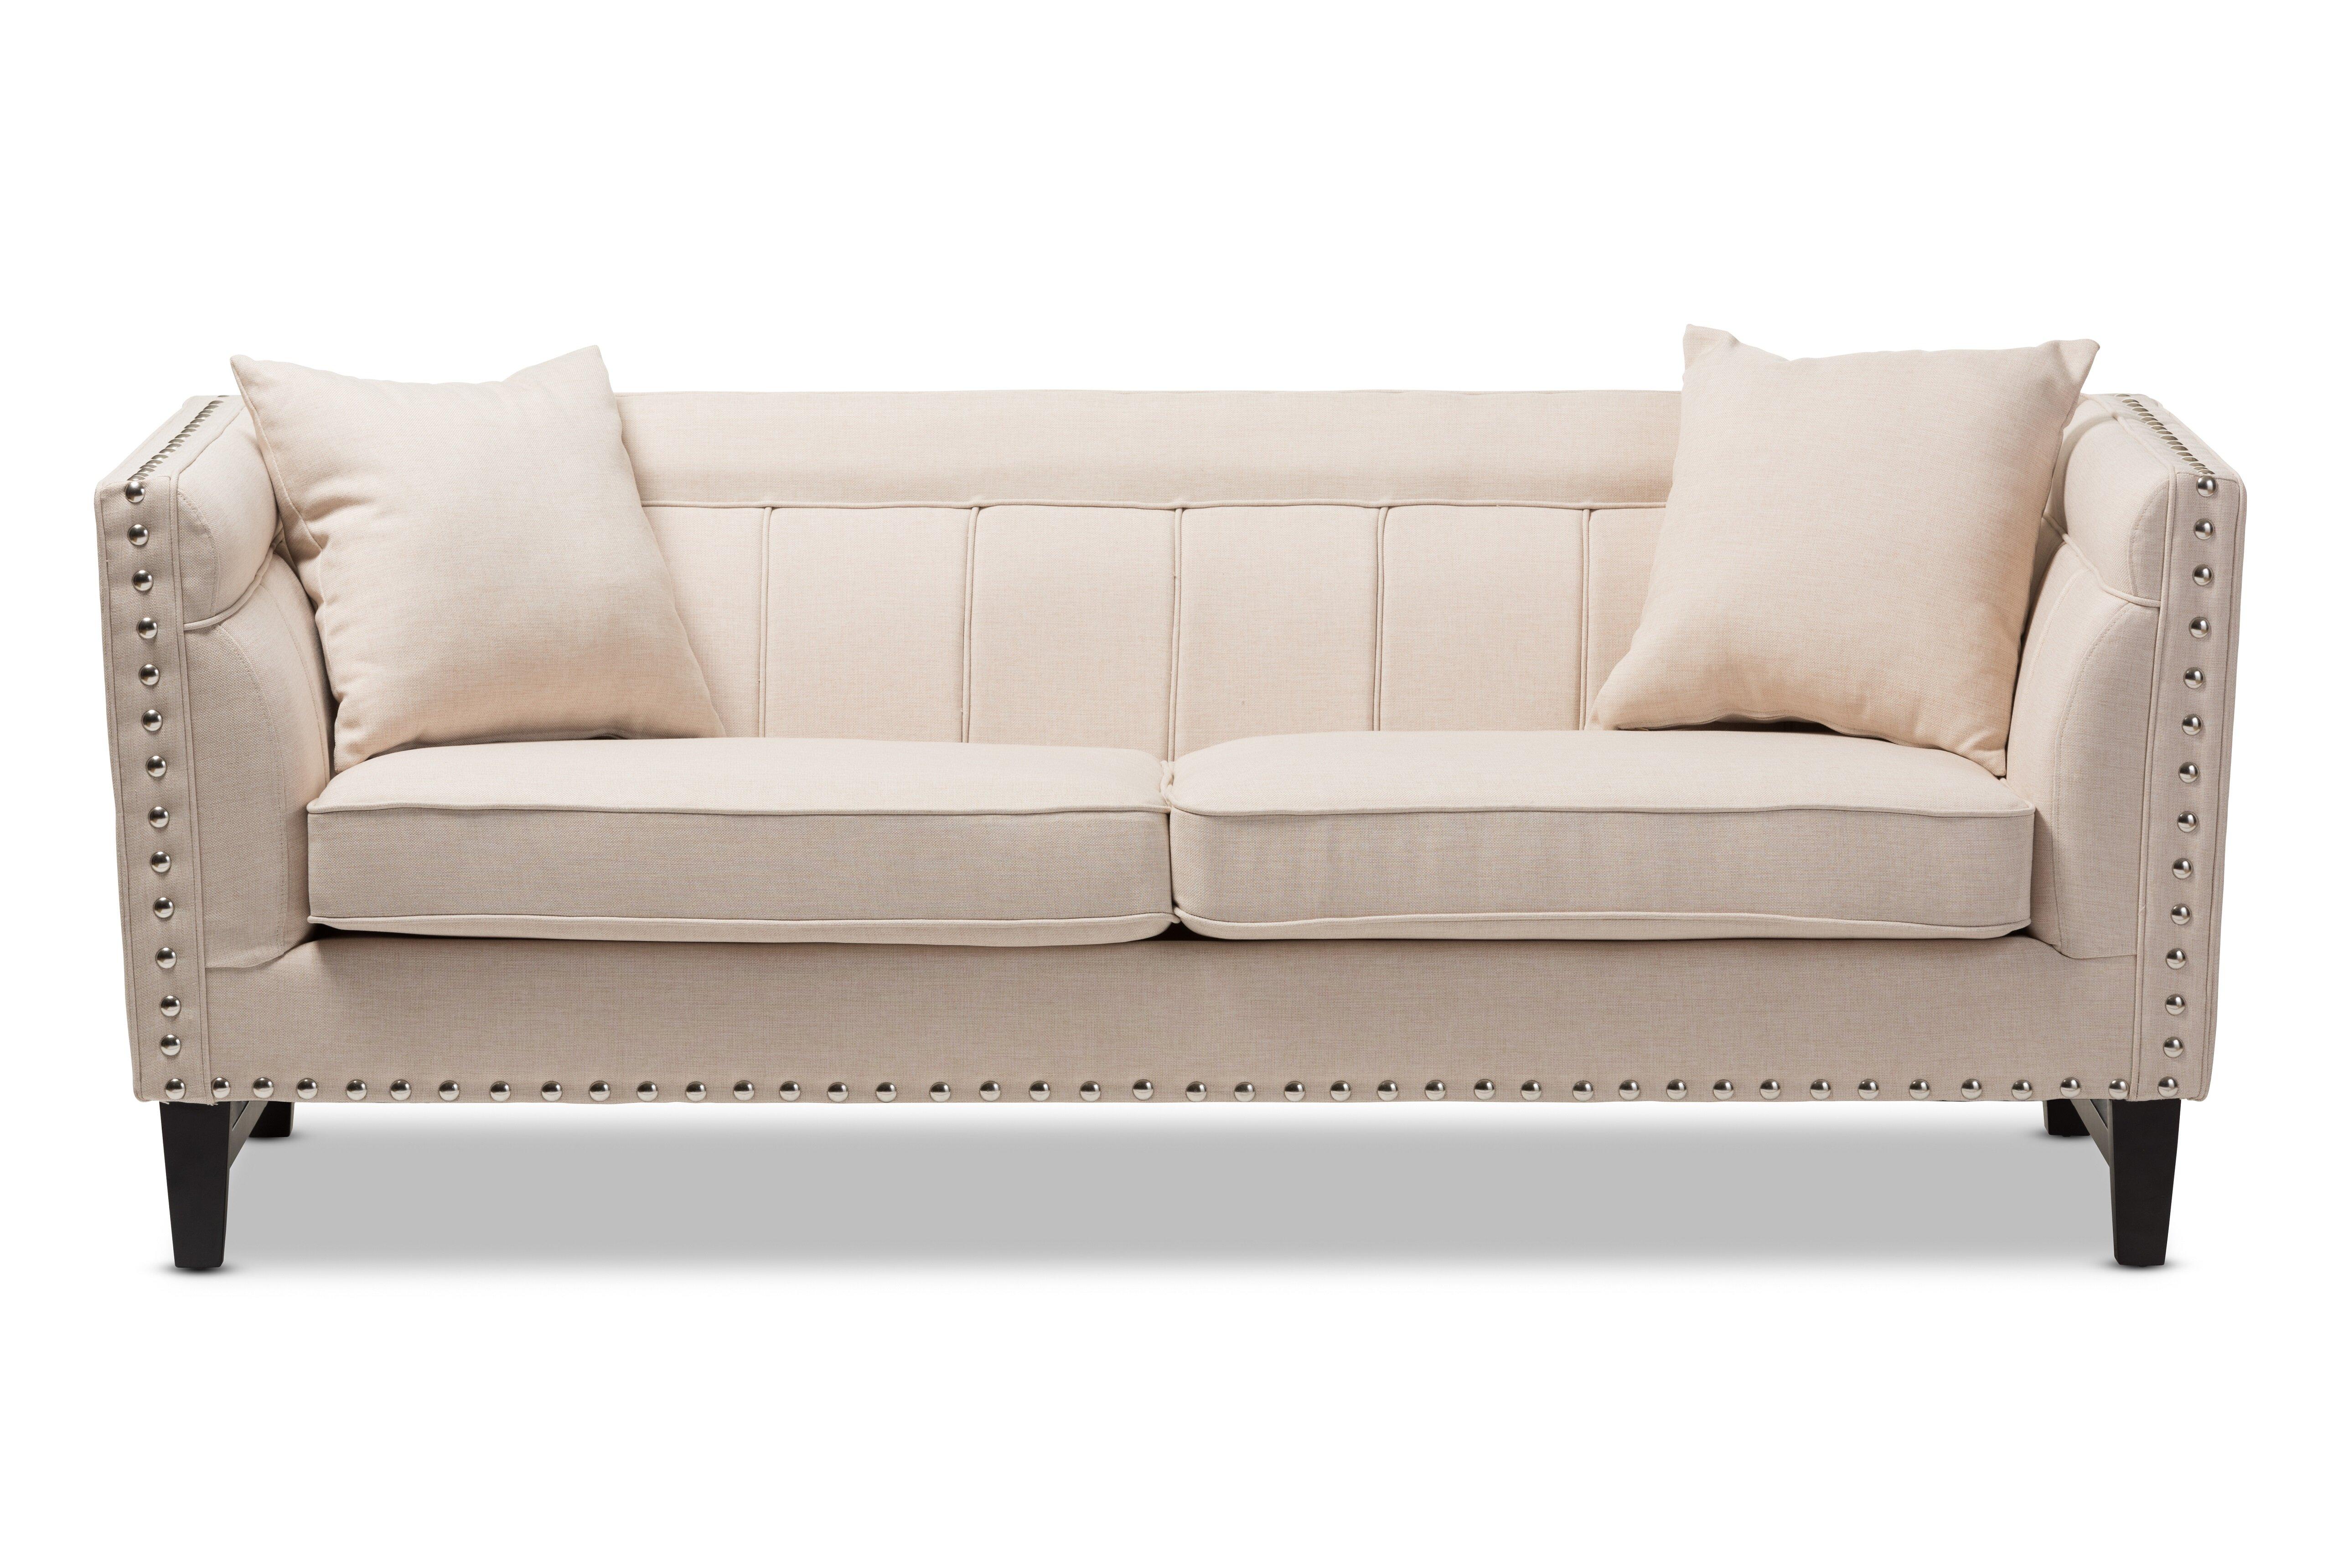 Merveilleux Wholesale Interiors Baxton Studio Stapleton Modern Sofa U0026 Reviews | Wayfair